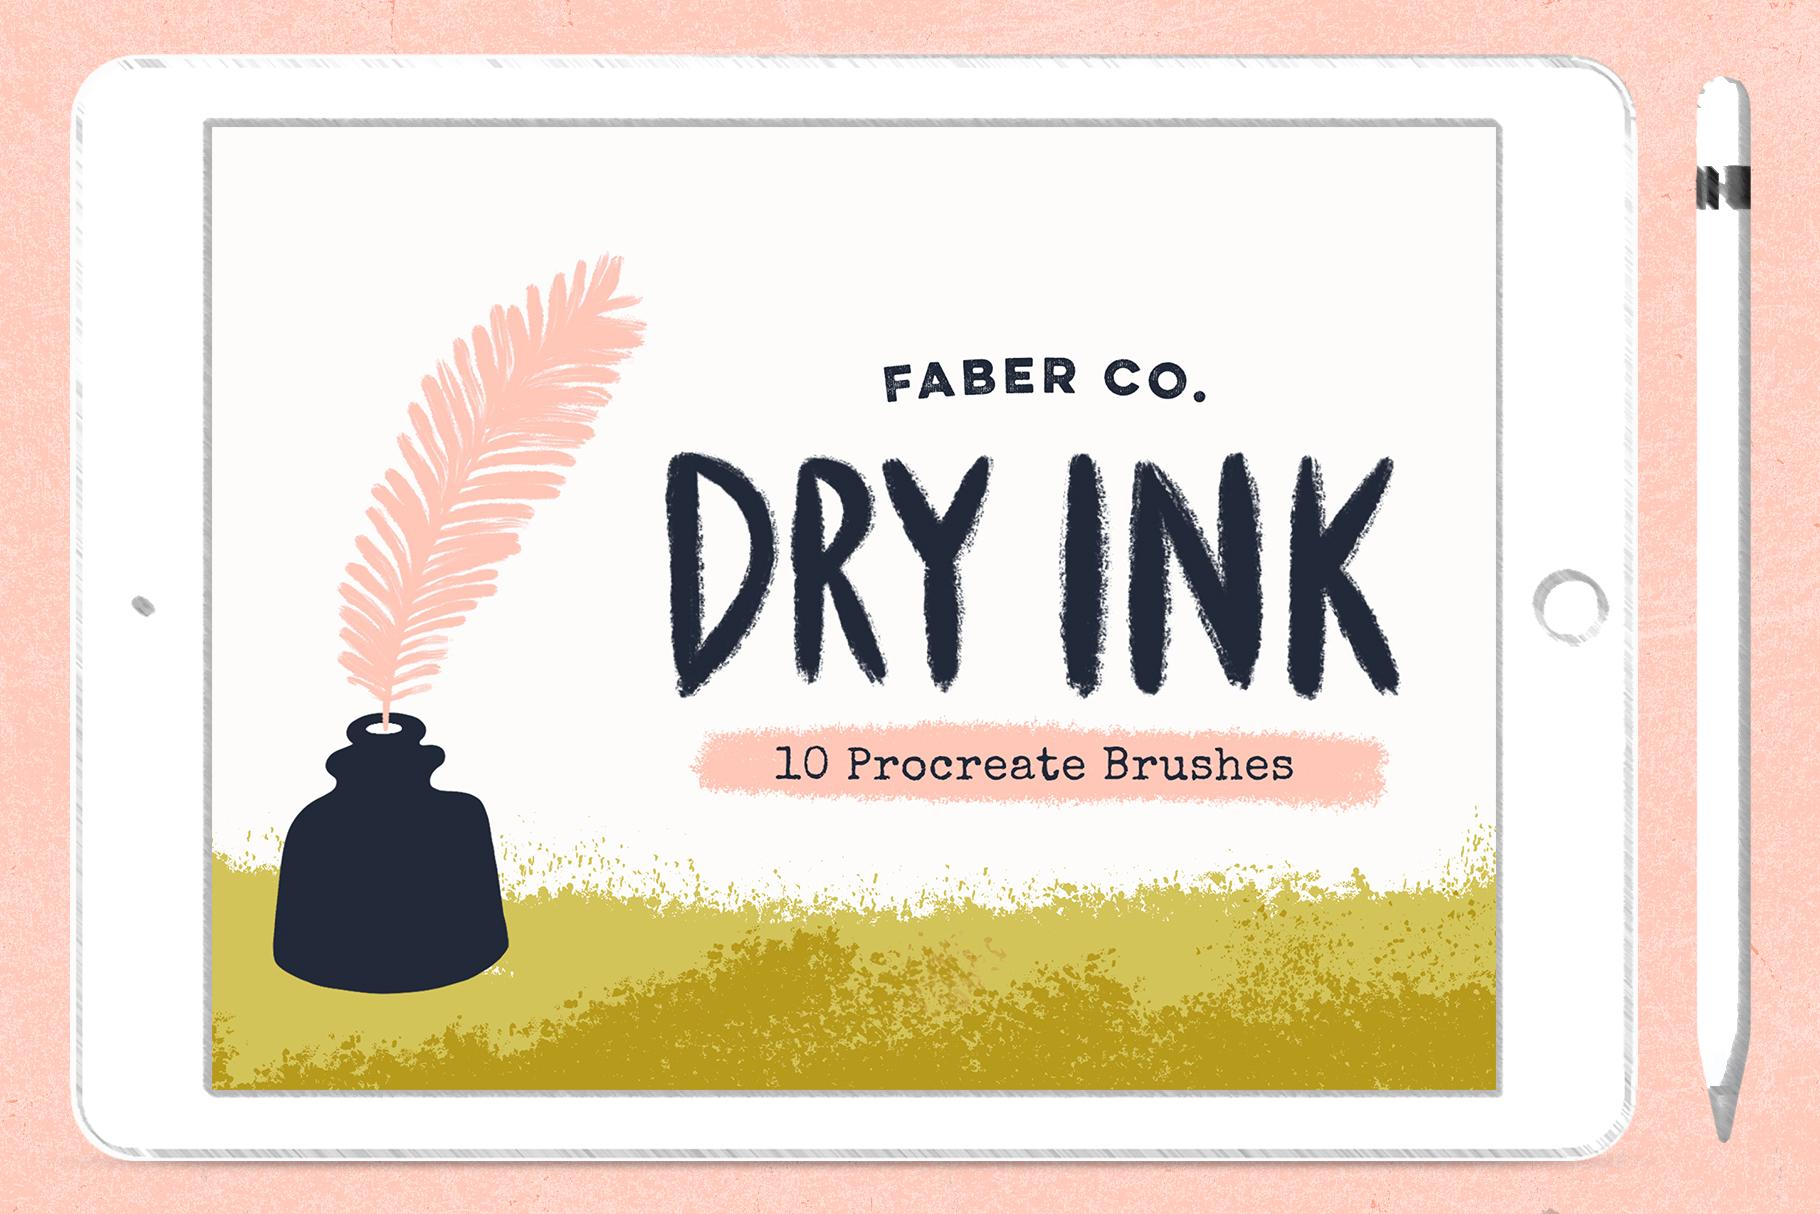 Dry-Ink_Ipad_Cover-Image_MOCKUP_Pencil.jpg